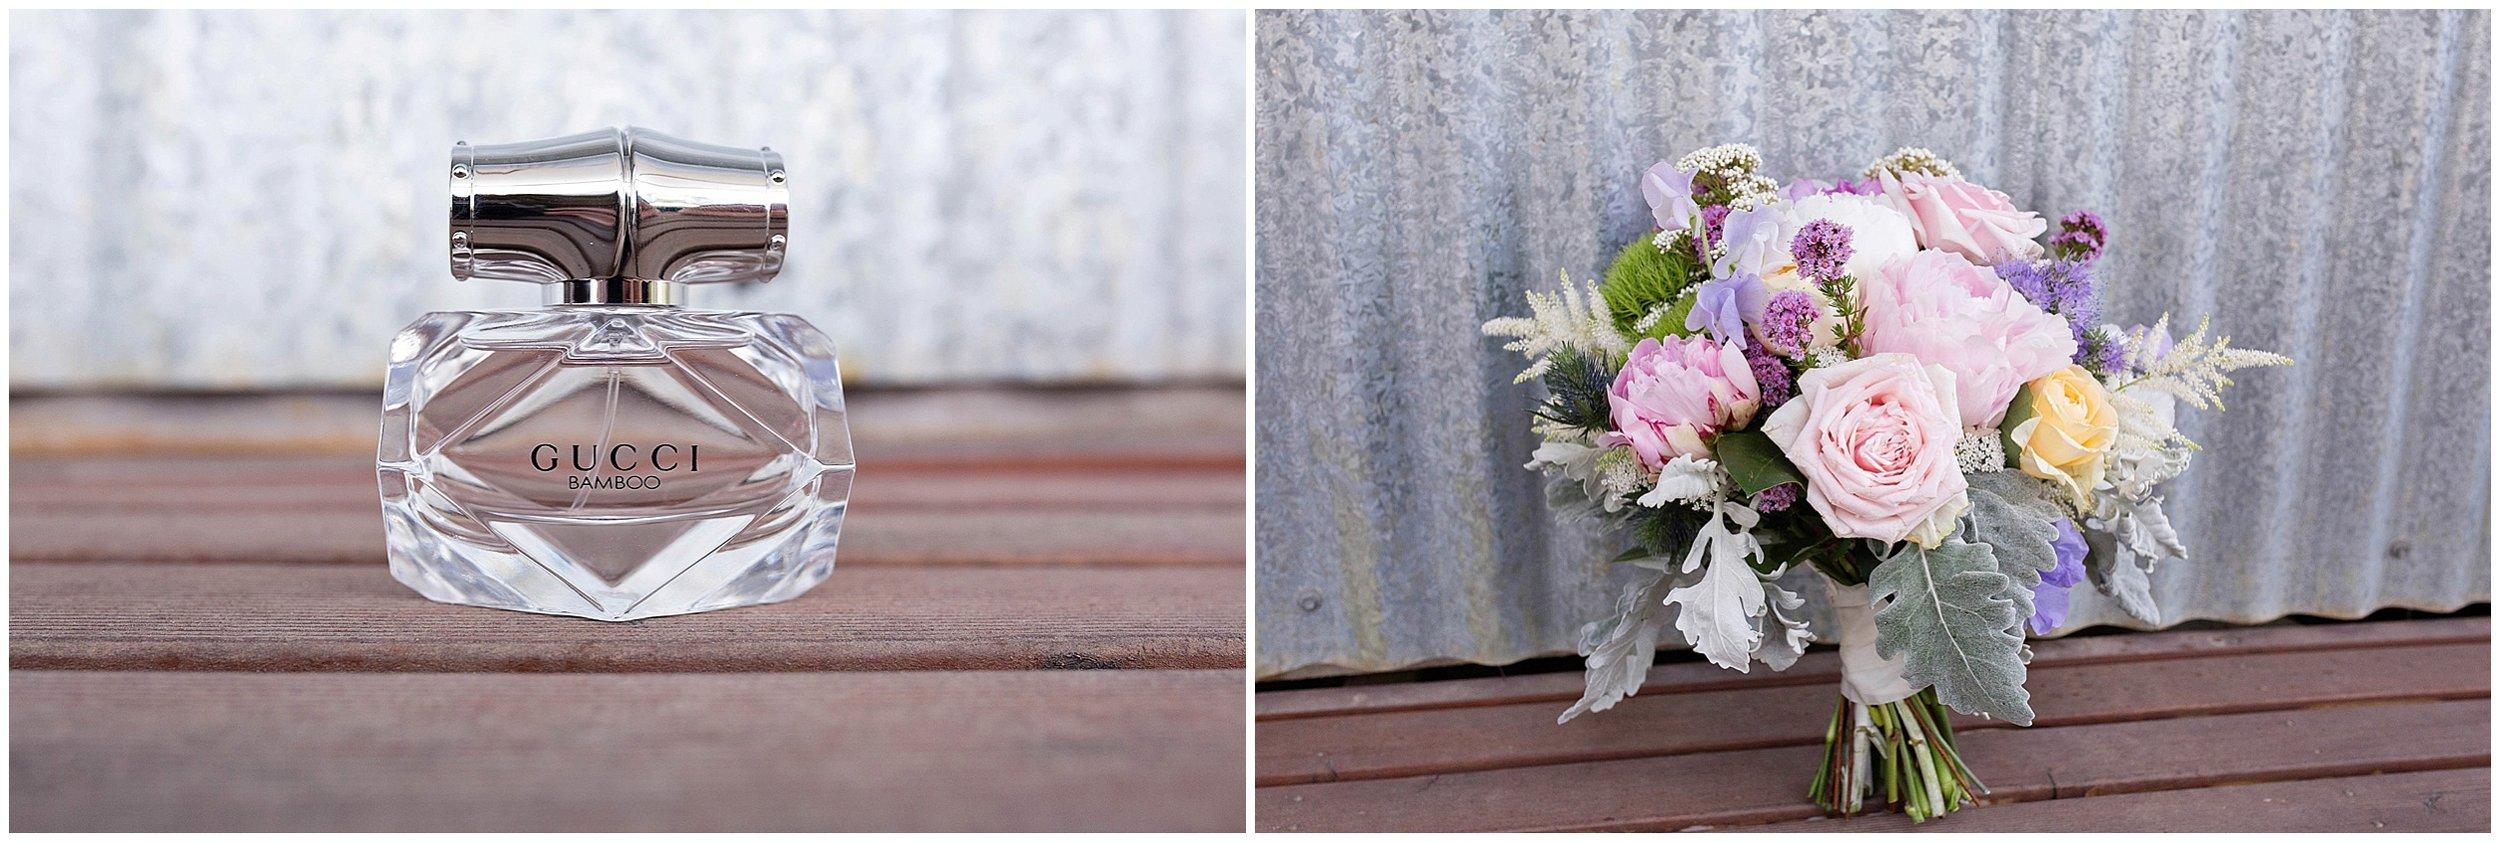 shepparton-wedding-photographer_0082.jpg